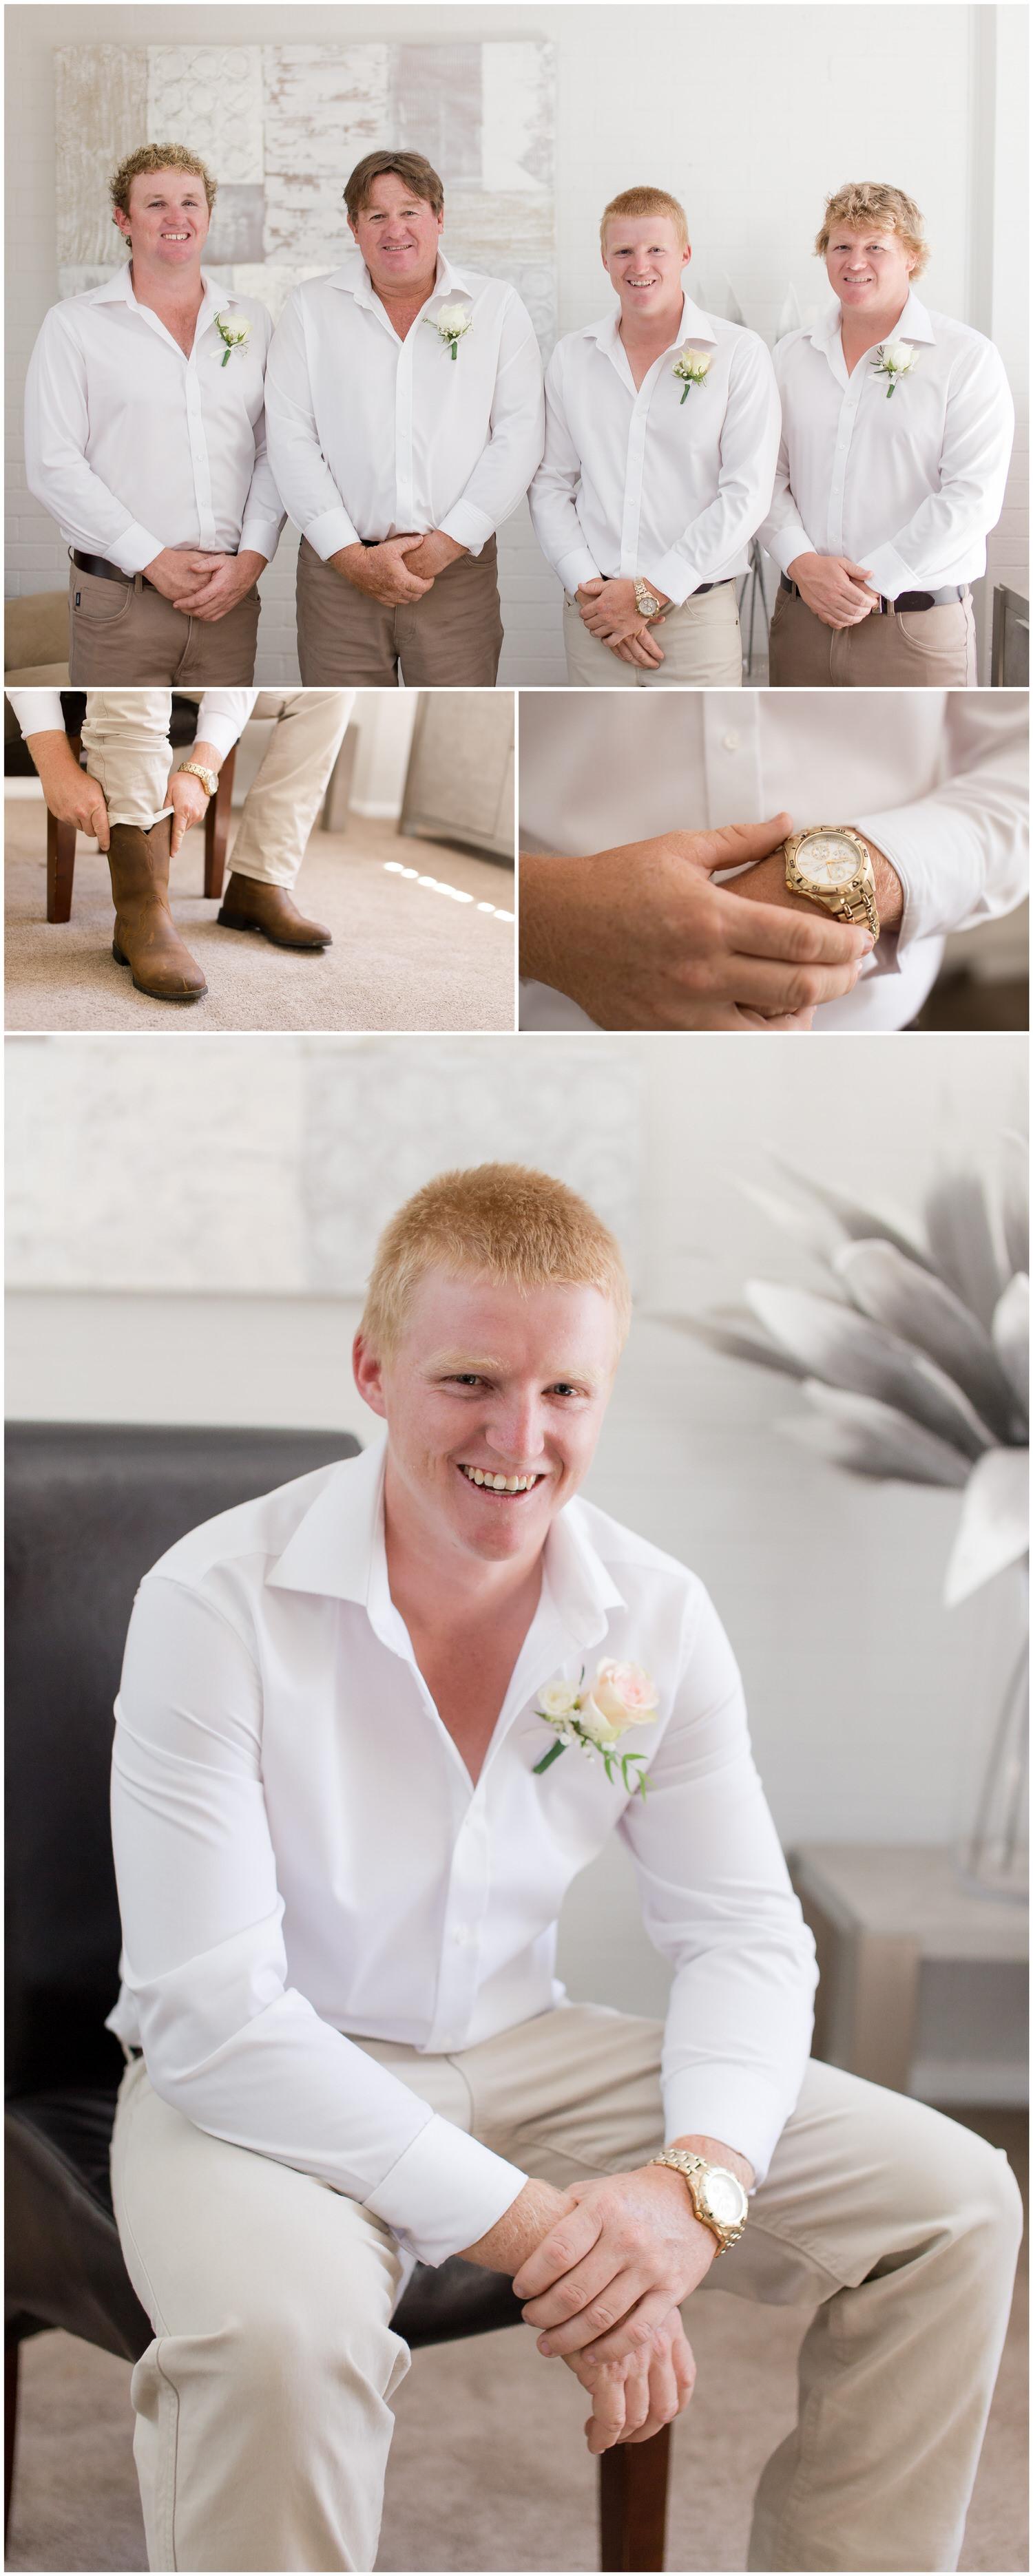 Dubbo Wedding Photography - Dubbo Golf Club Wedding 1